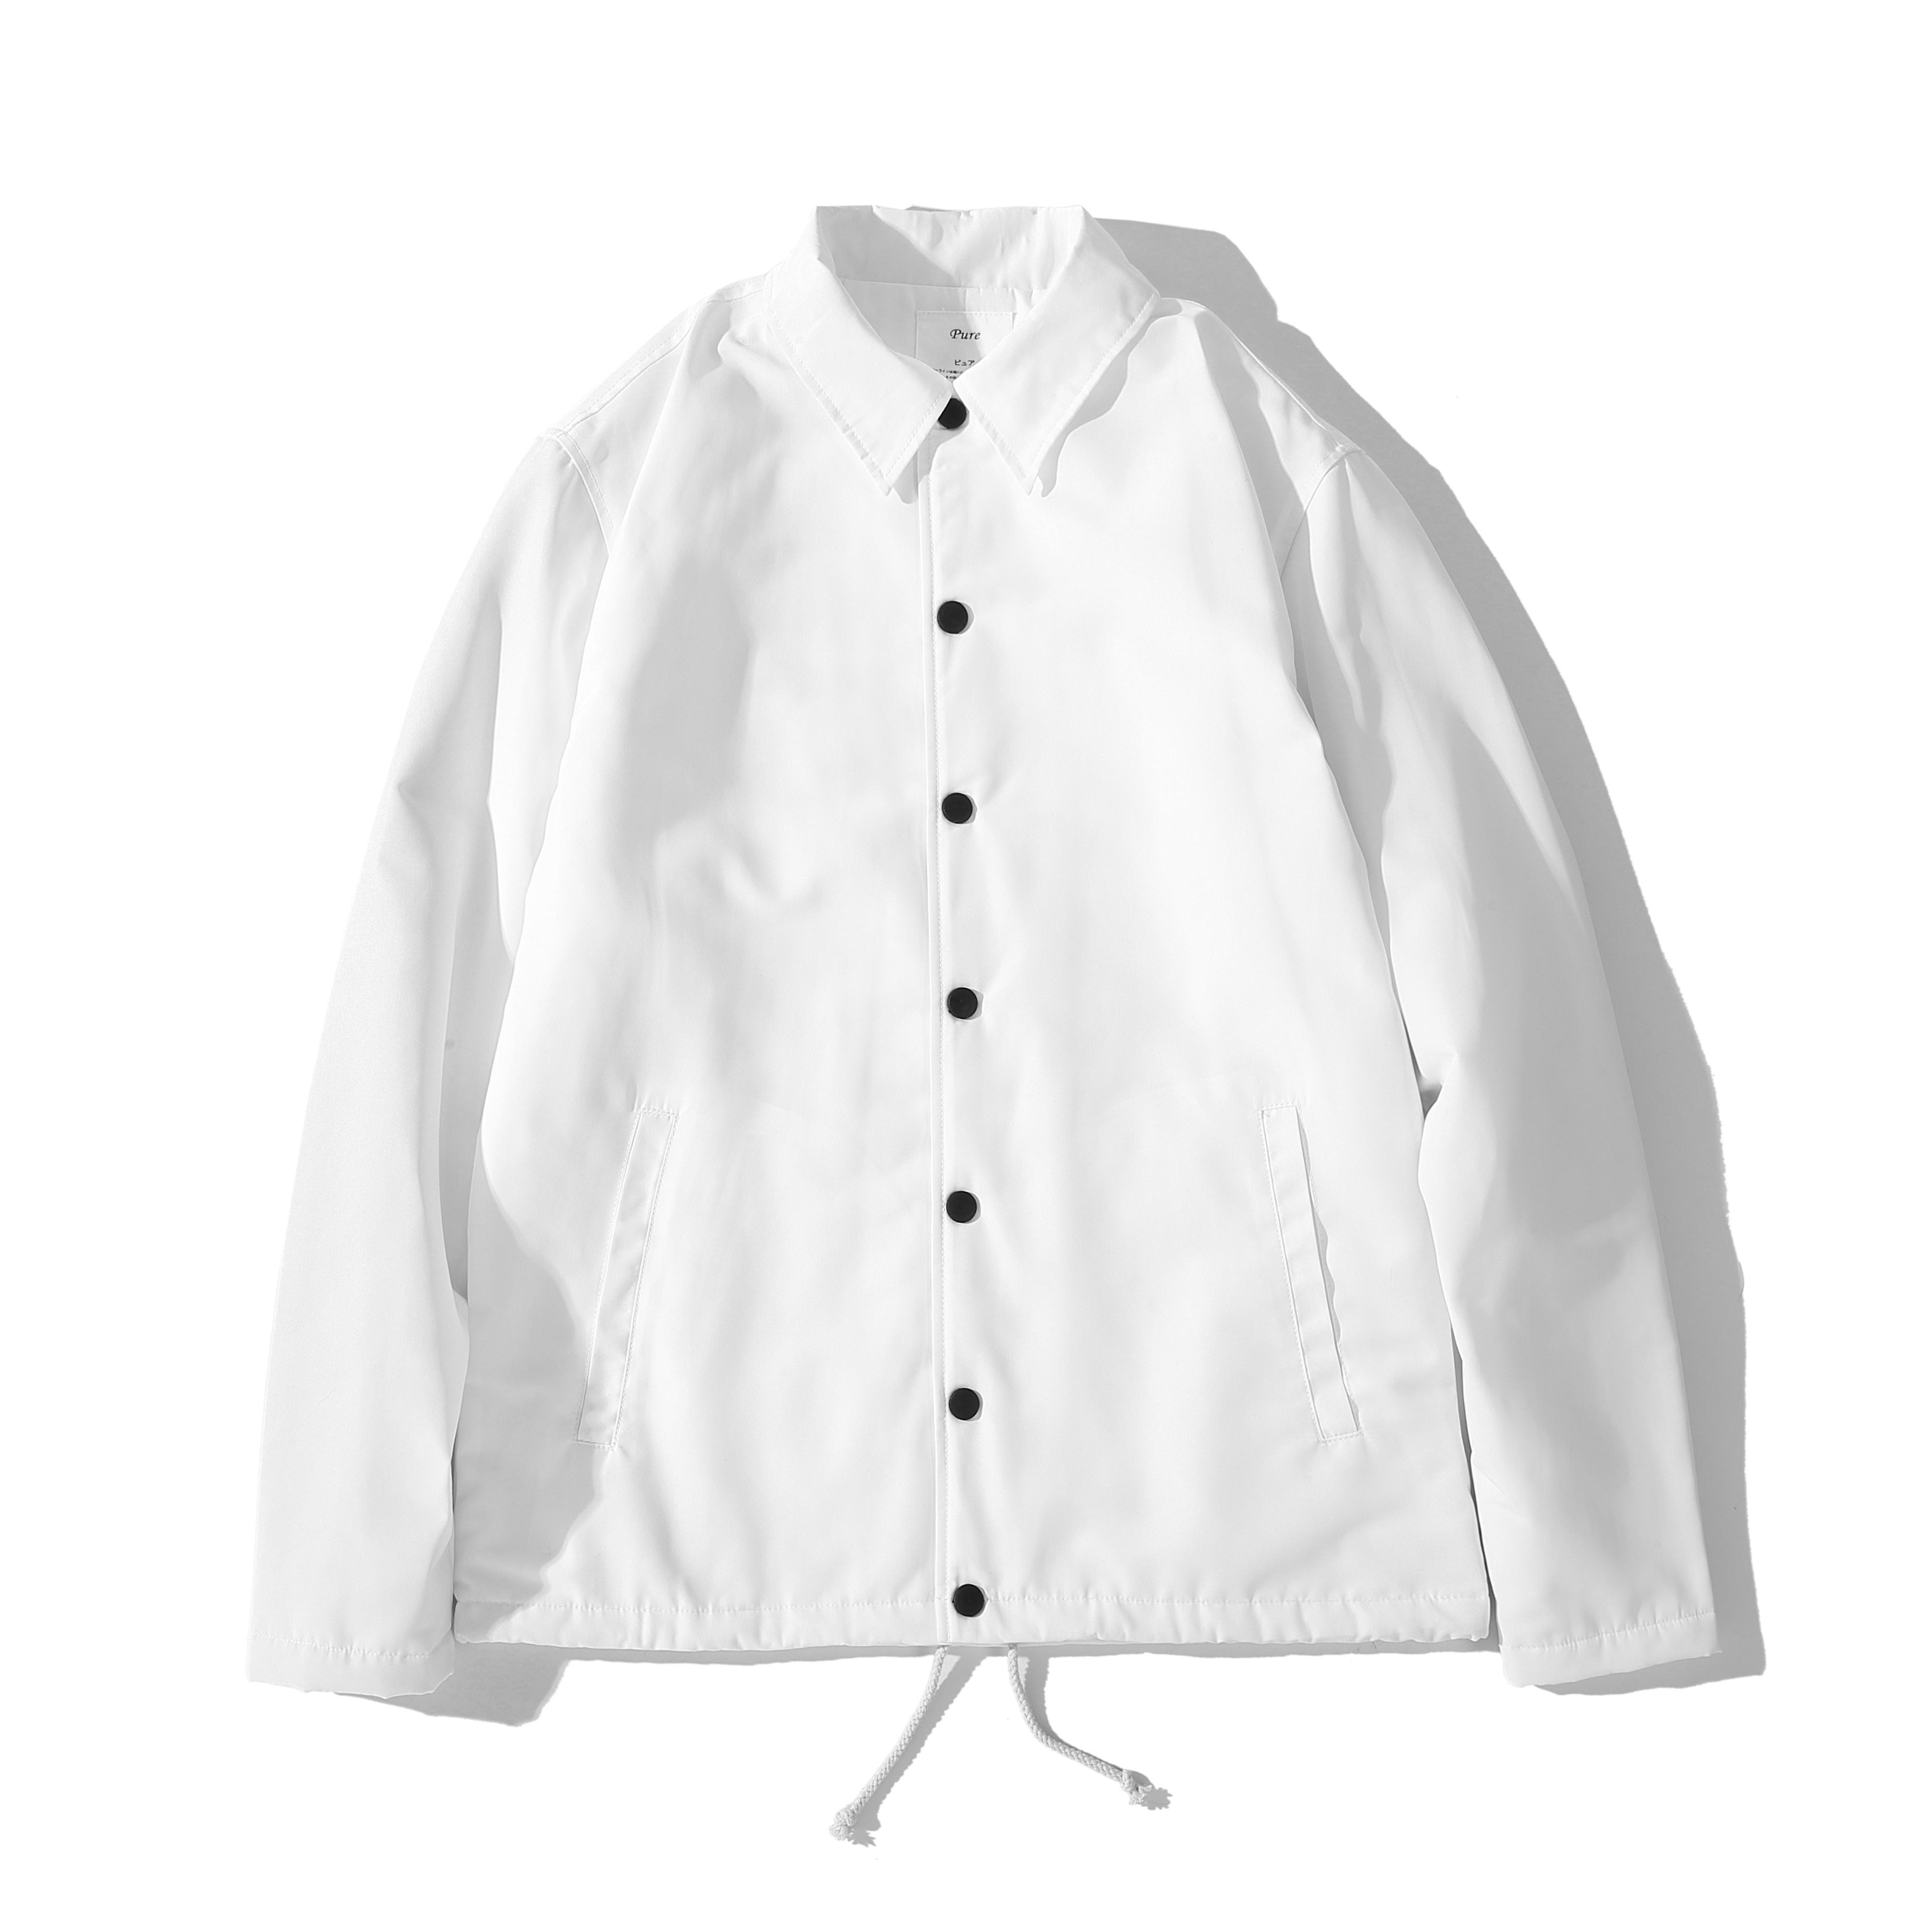 PureBrand 日本进口面料 羊羔绒教练夹克 高级防水抗风 黑白